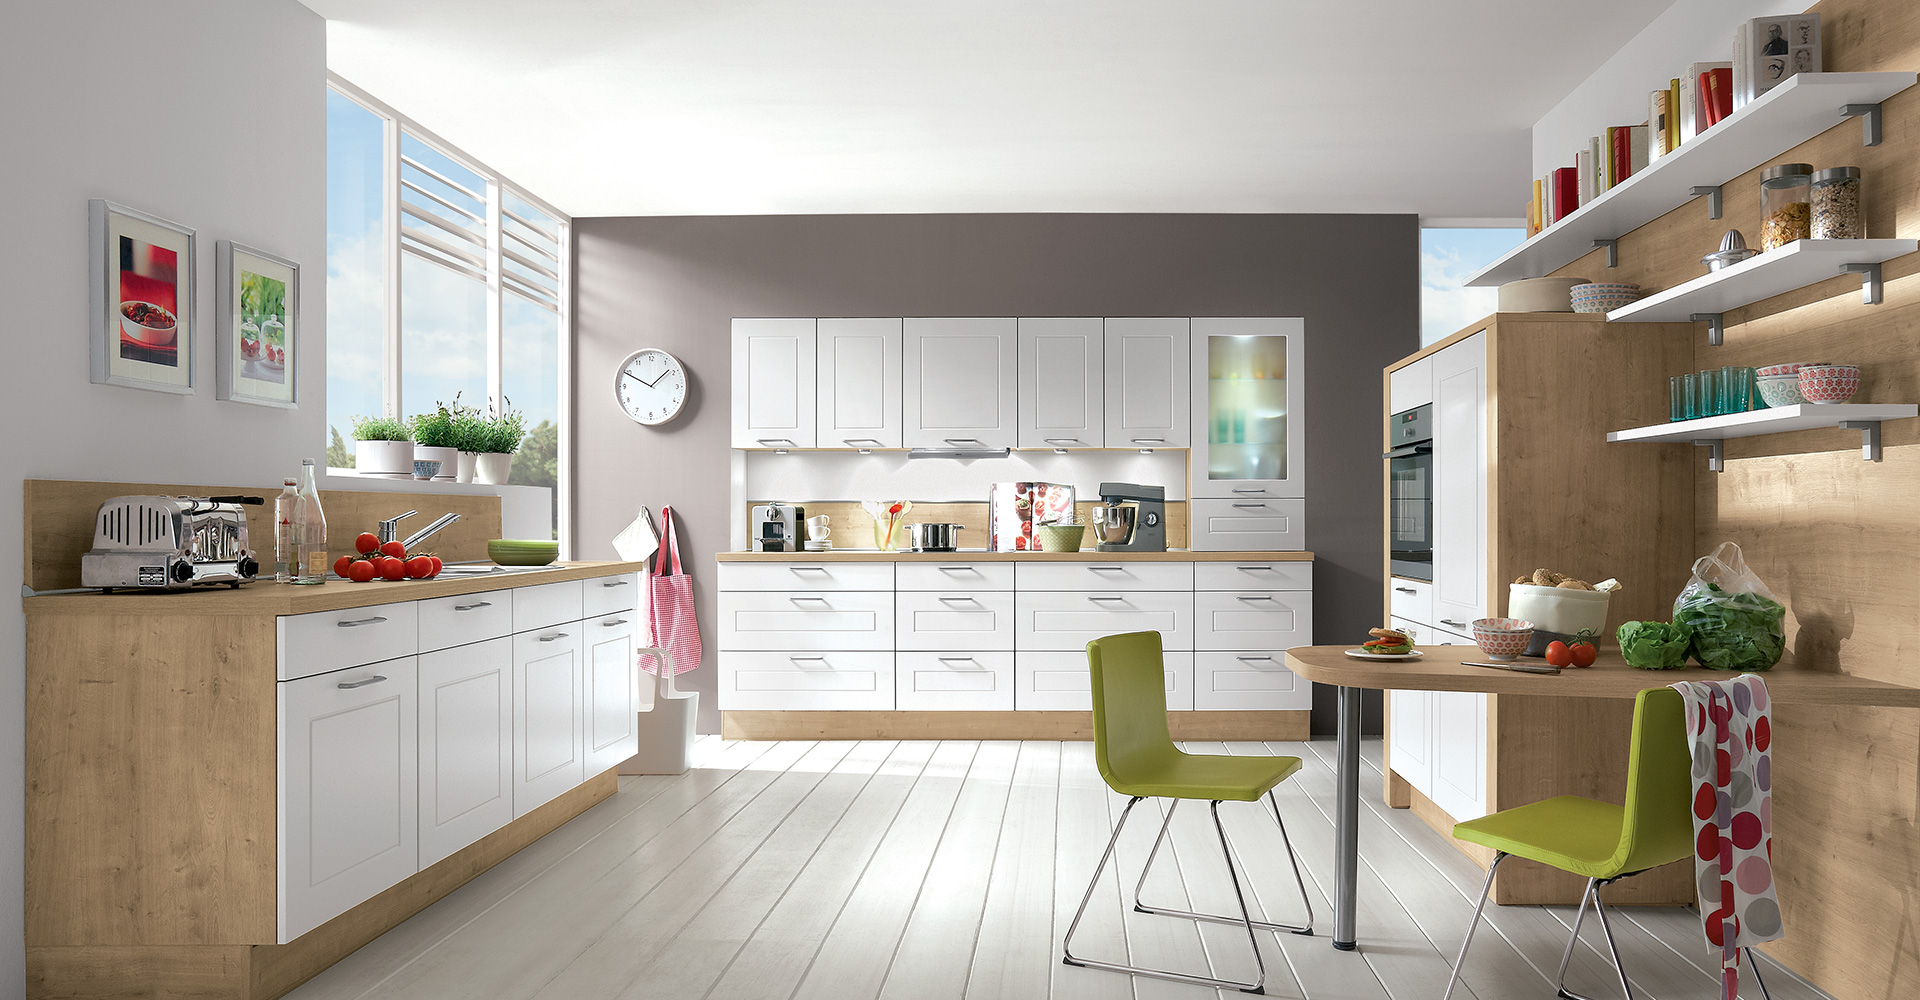 Tijdloze keukens   eindeloos kookgenot   otten keukens & sanitair